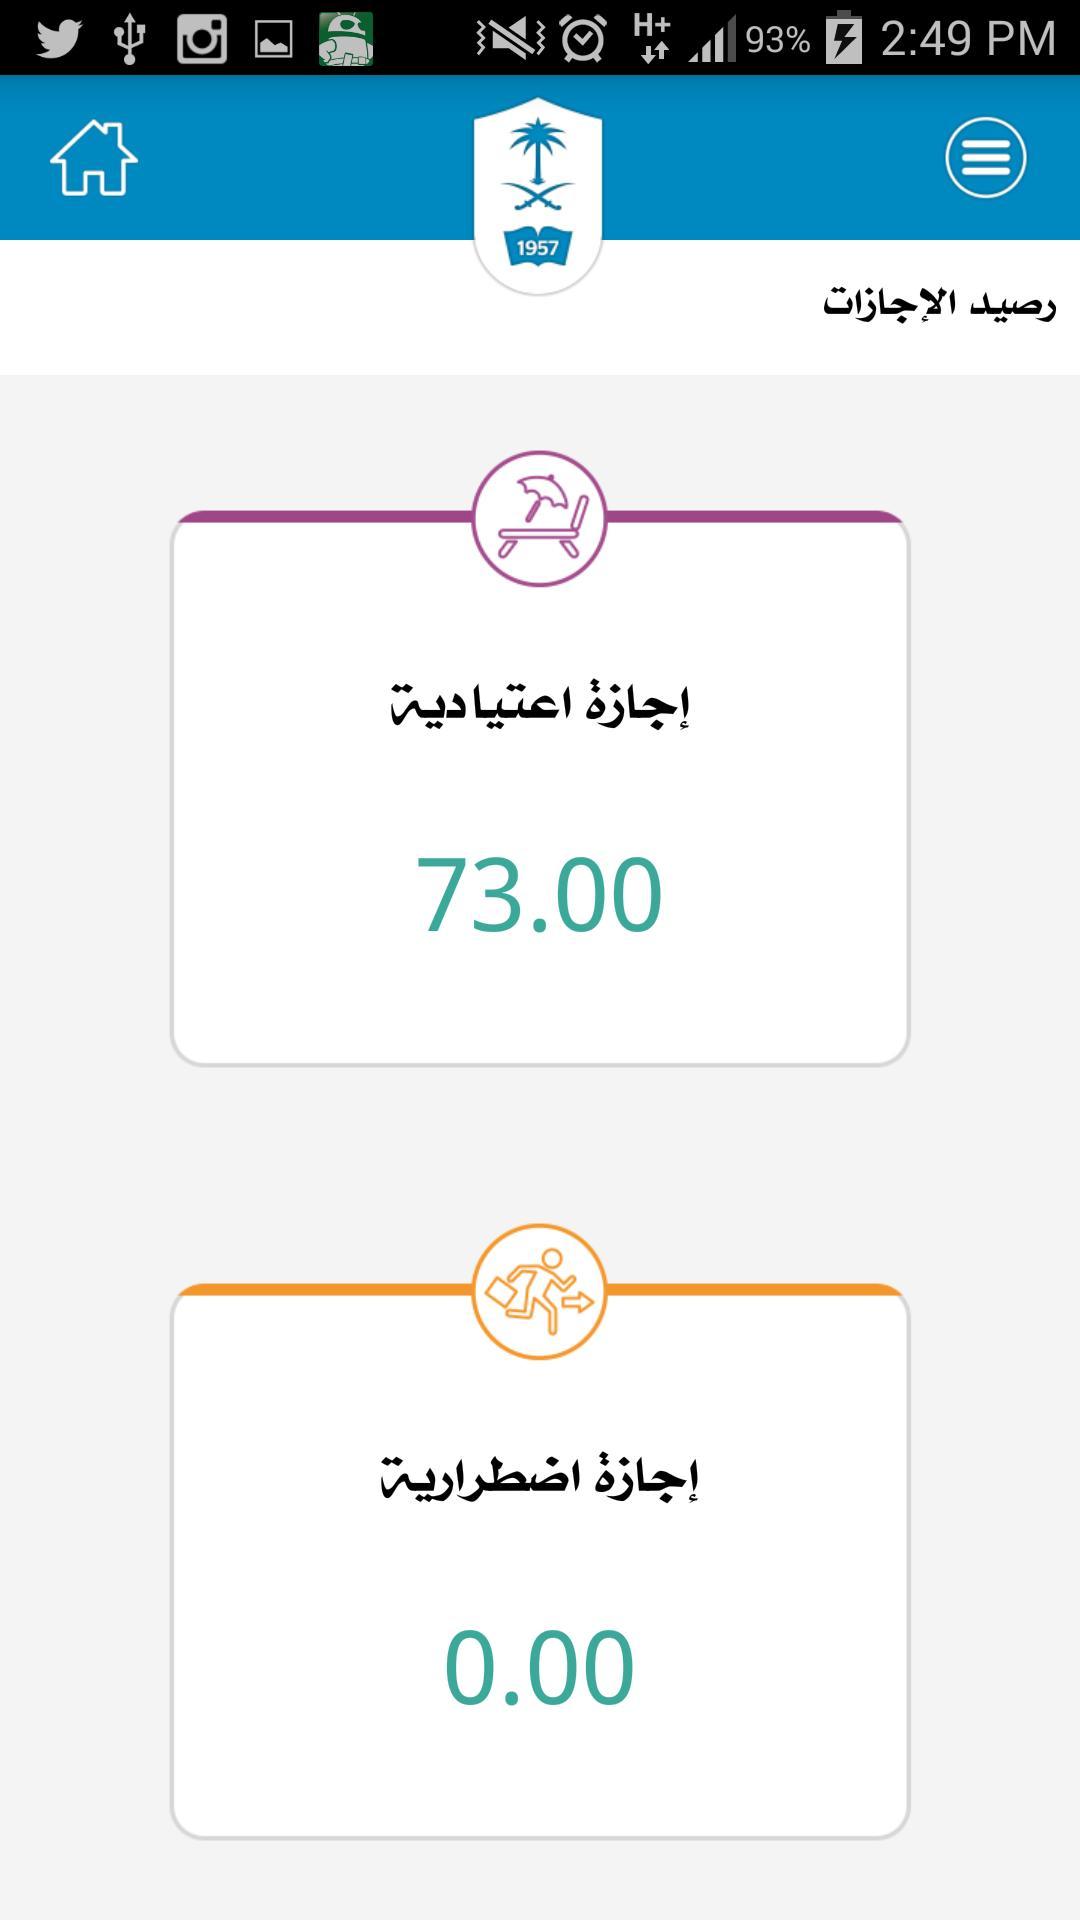 بريد طلاب سعود 10 6